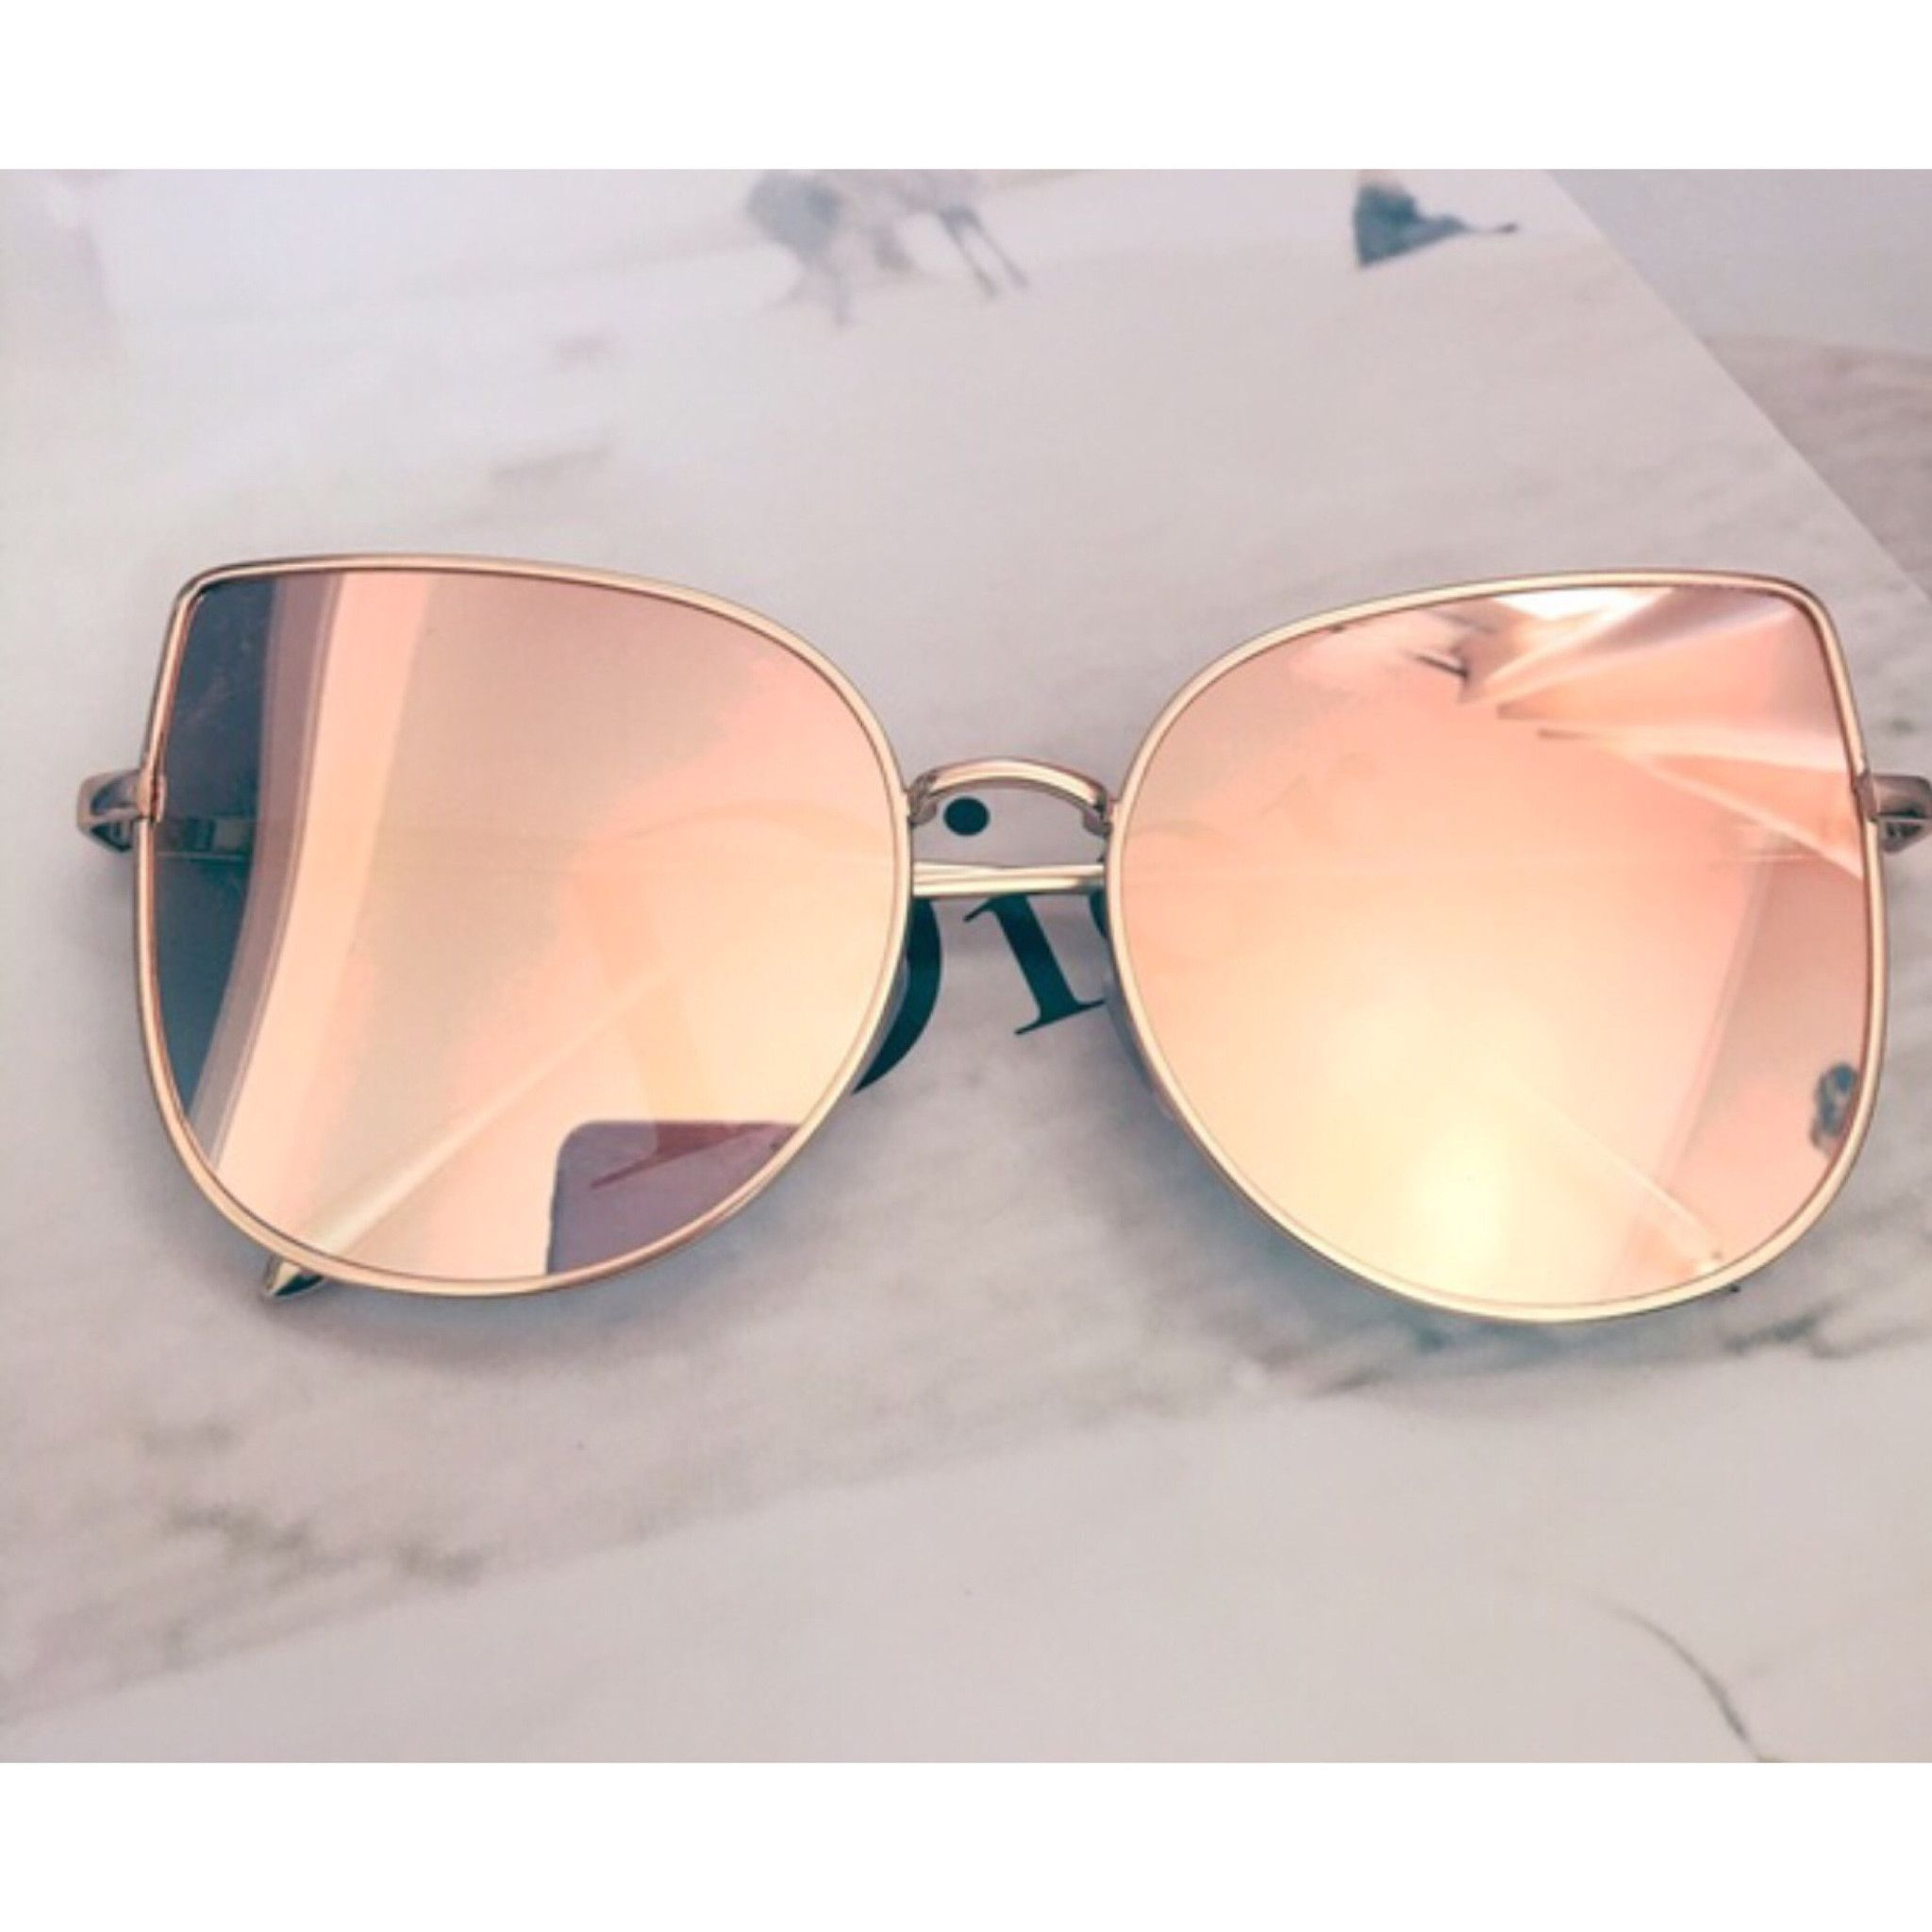 Rose Gold Cat Eye Sunglasses Gold Mirror Sunglasses Rose Gold Sunglasses Rose Gold Mirrored Sunglasses